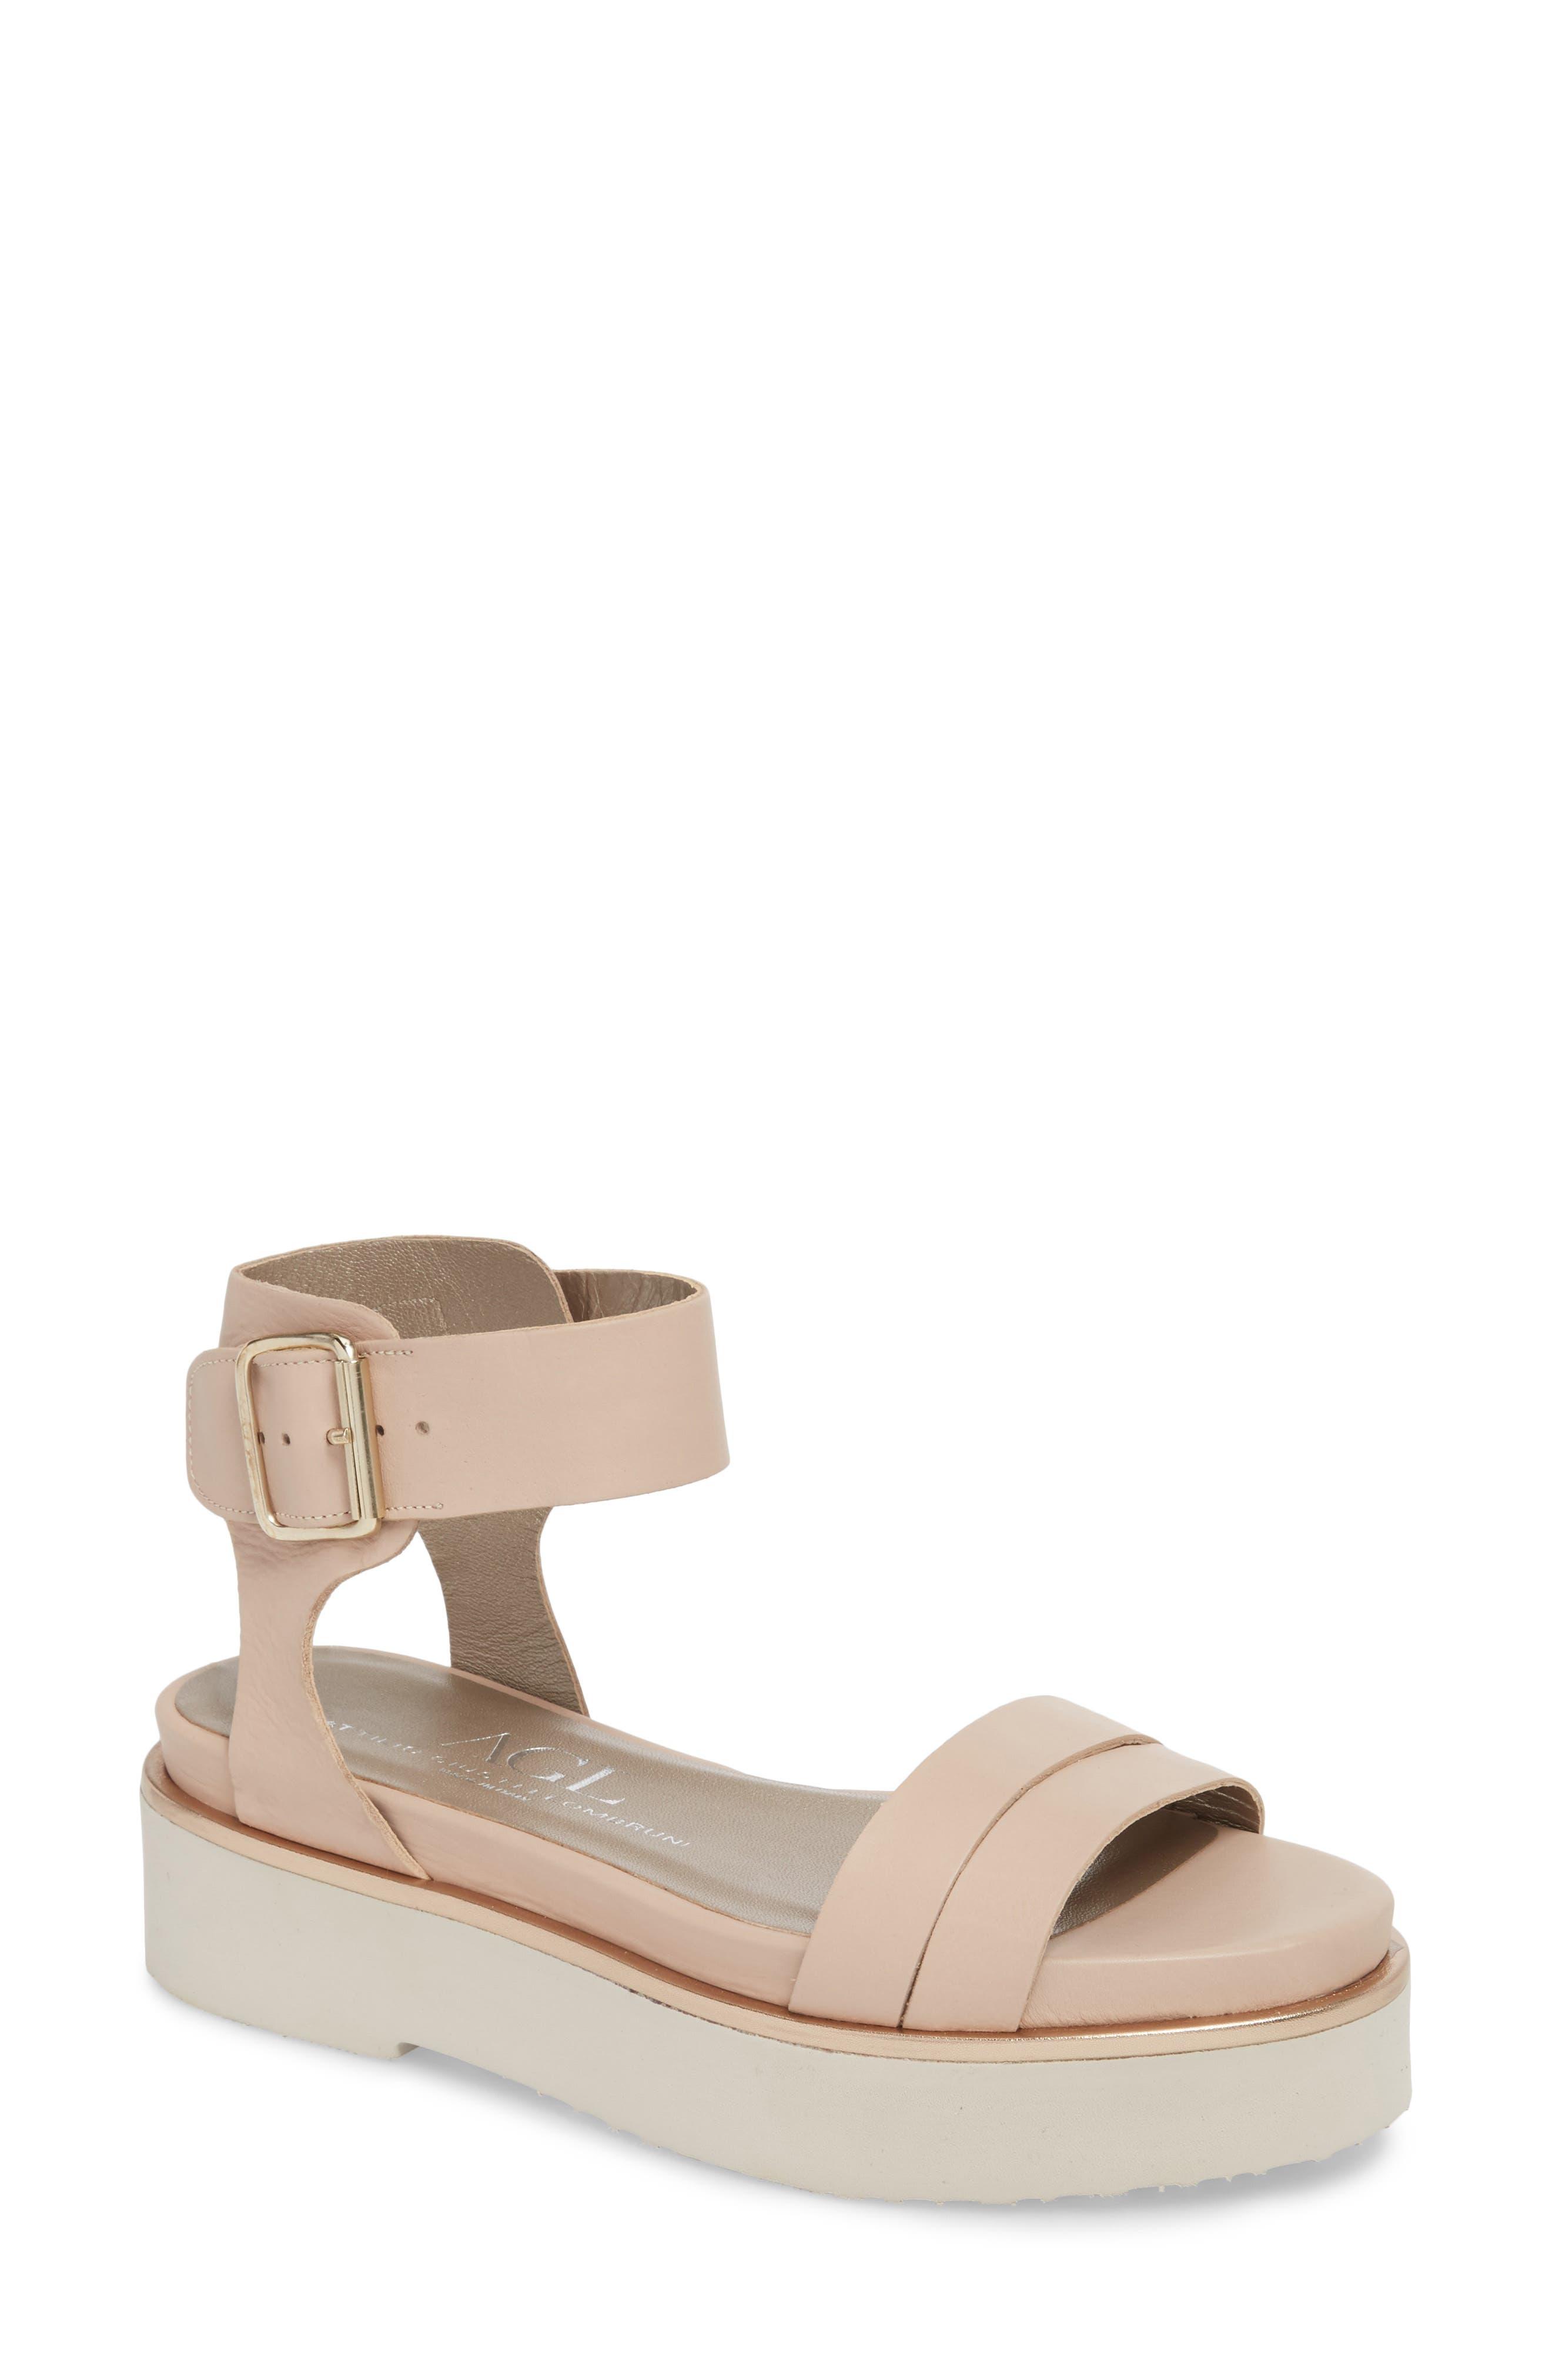 Quarter Strap Platform Sandal,                             Main thumbnail 1, color,                             255